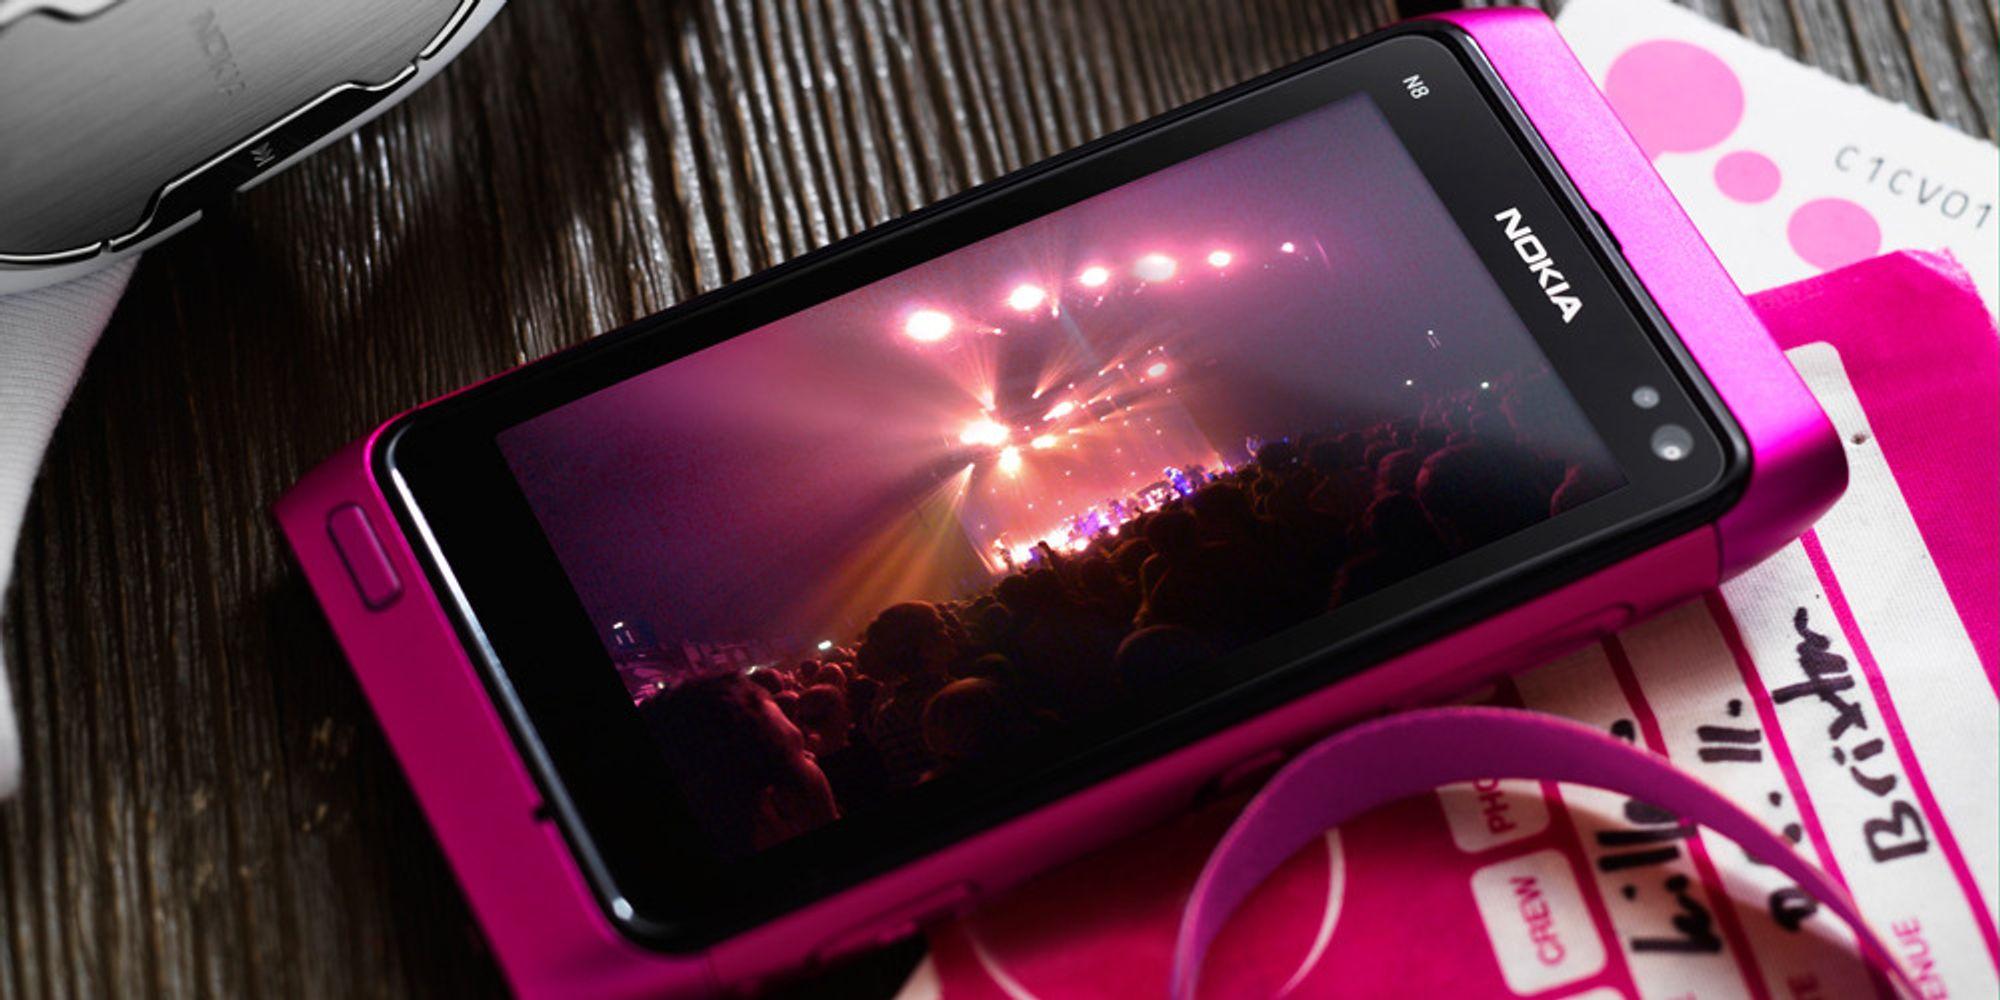 Nokia N8 kommer i rosa